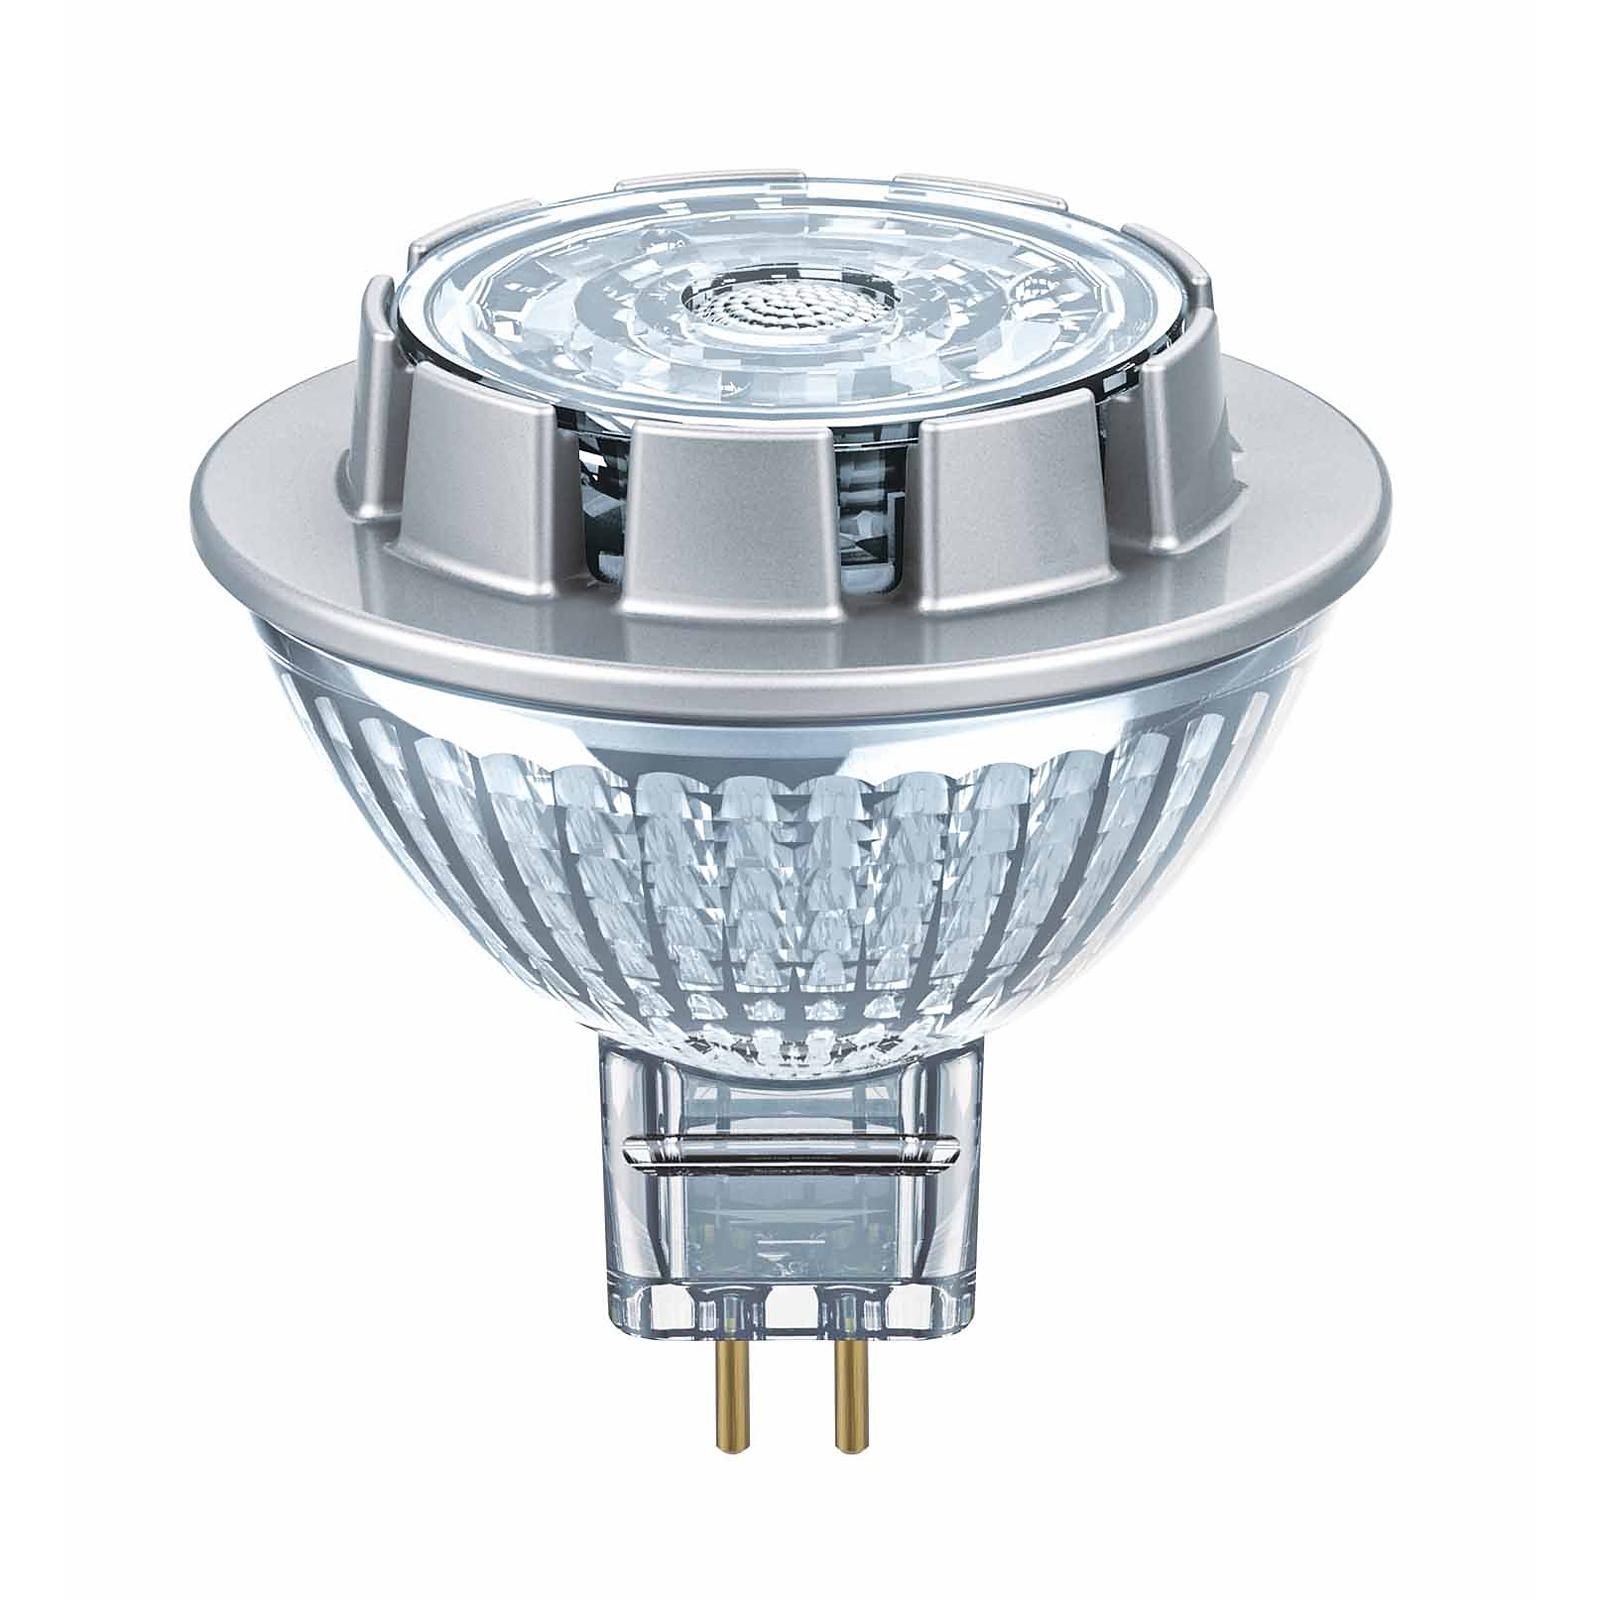 osram led star mr16 gu5 3 7 2 watt ersetzt 50 watt 621 lm 36 neutral wei. Black Bedroom Furniture Sets. Home Design Ideas